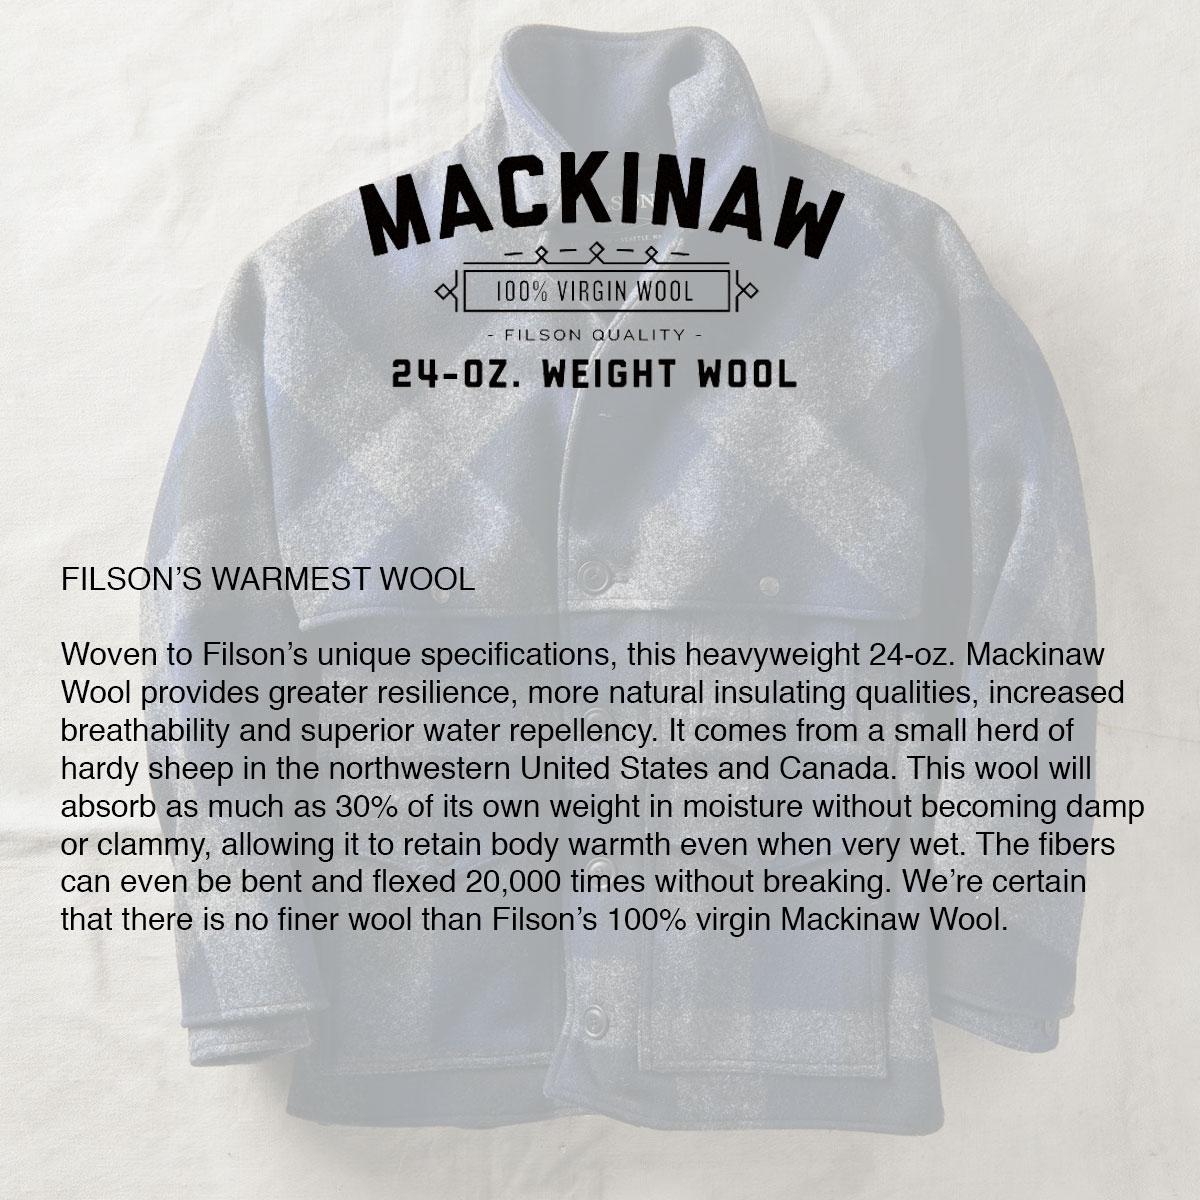 Filson Filson Double Mackinaw Cruiser Charcoal/Black/Navy, warmest wool